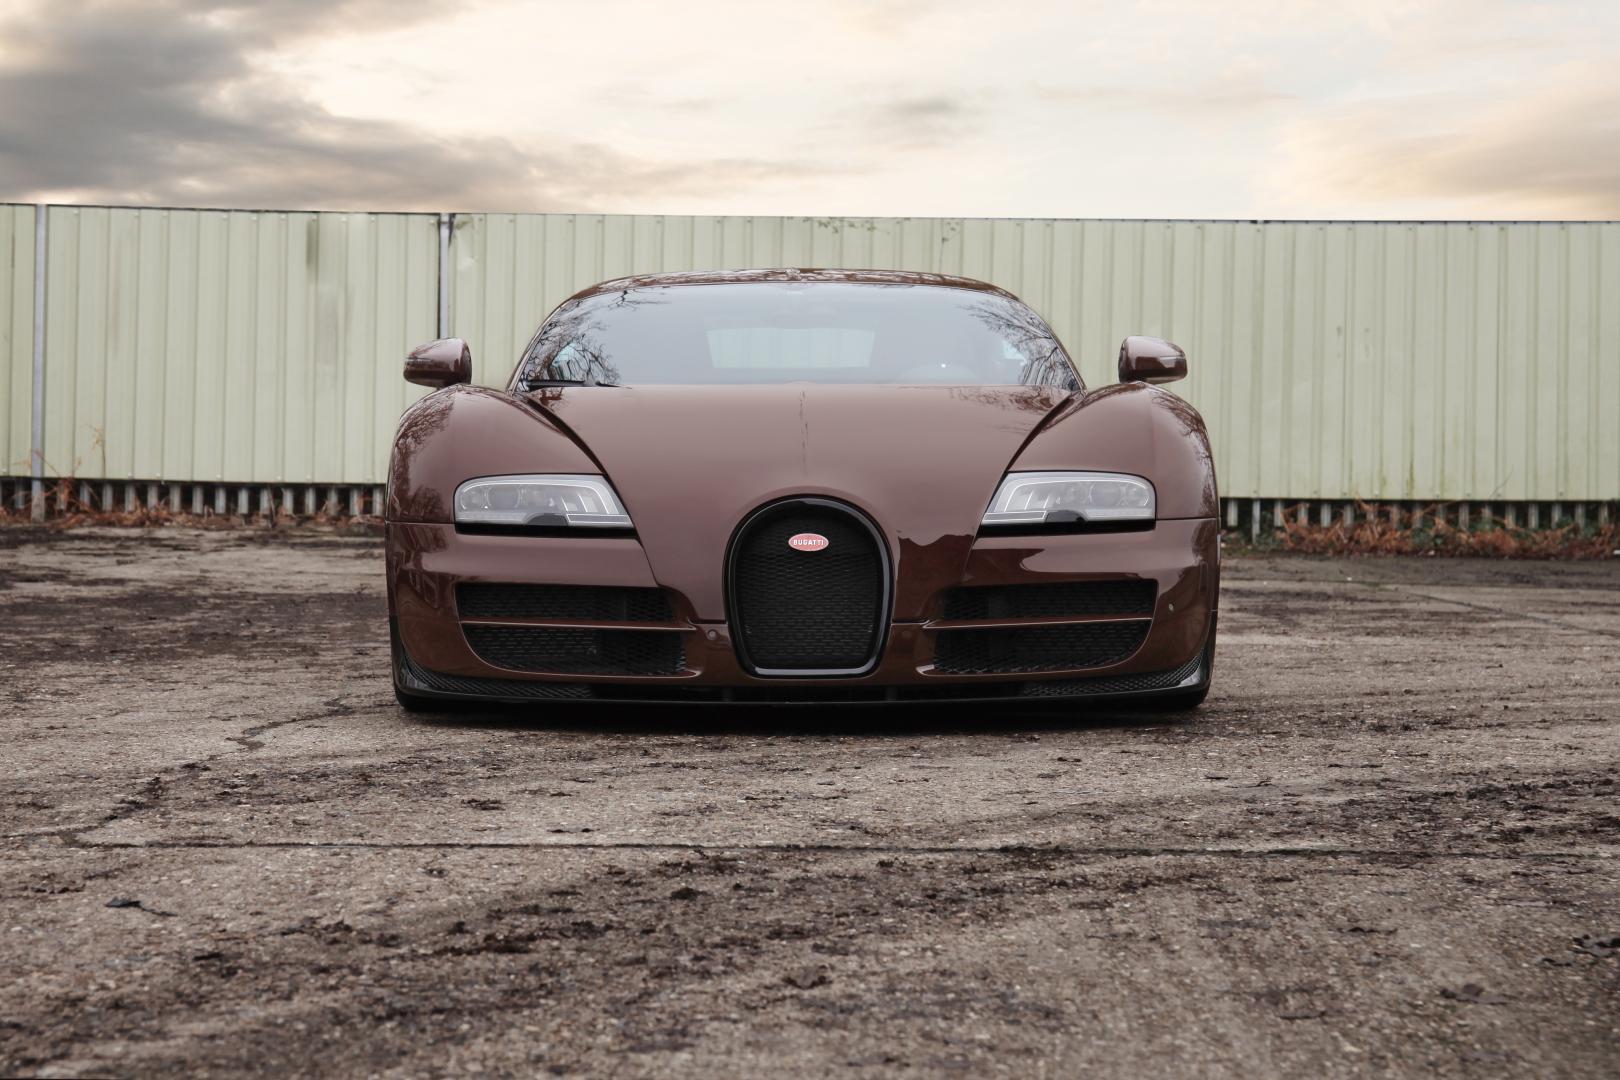 Bruine Bugatti Veyron Super Sport